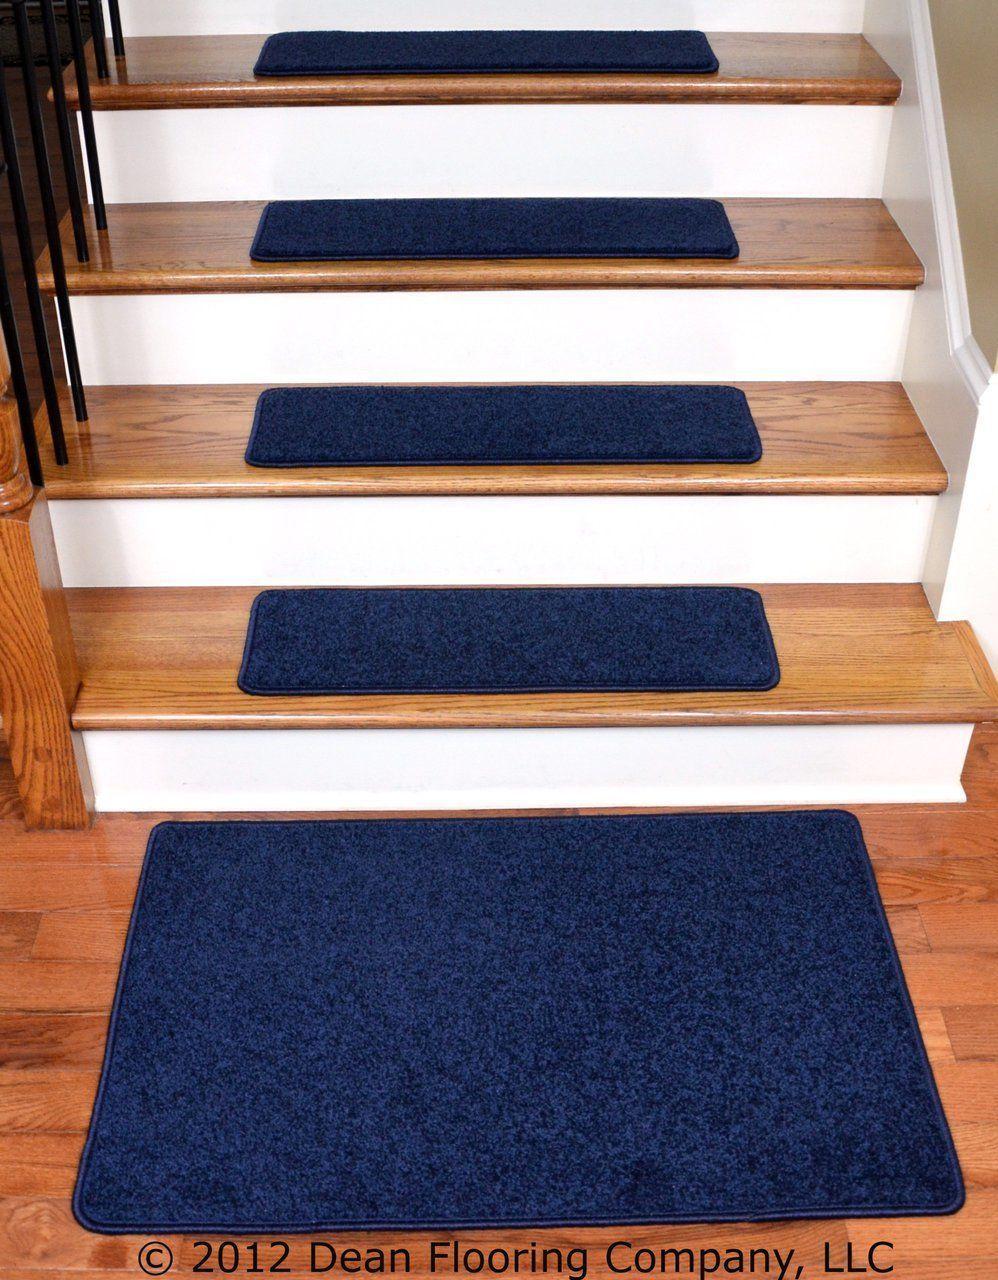 Best Dean Carpet Stair Treads 27 X 9 Navy Blue Plush 13 640 x 480